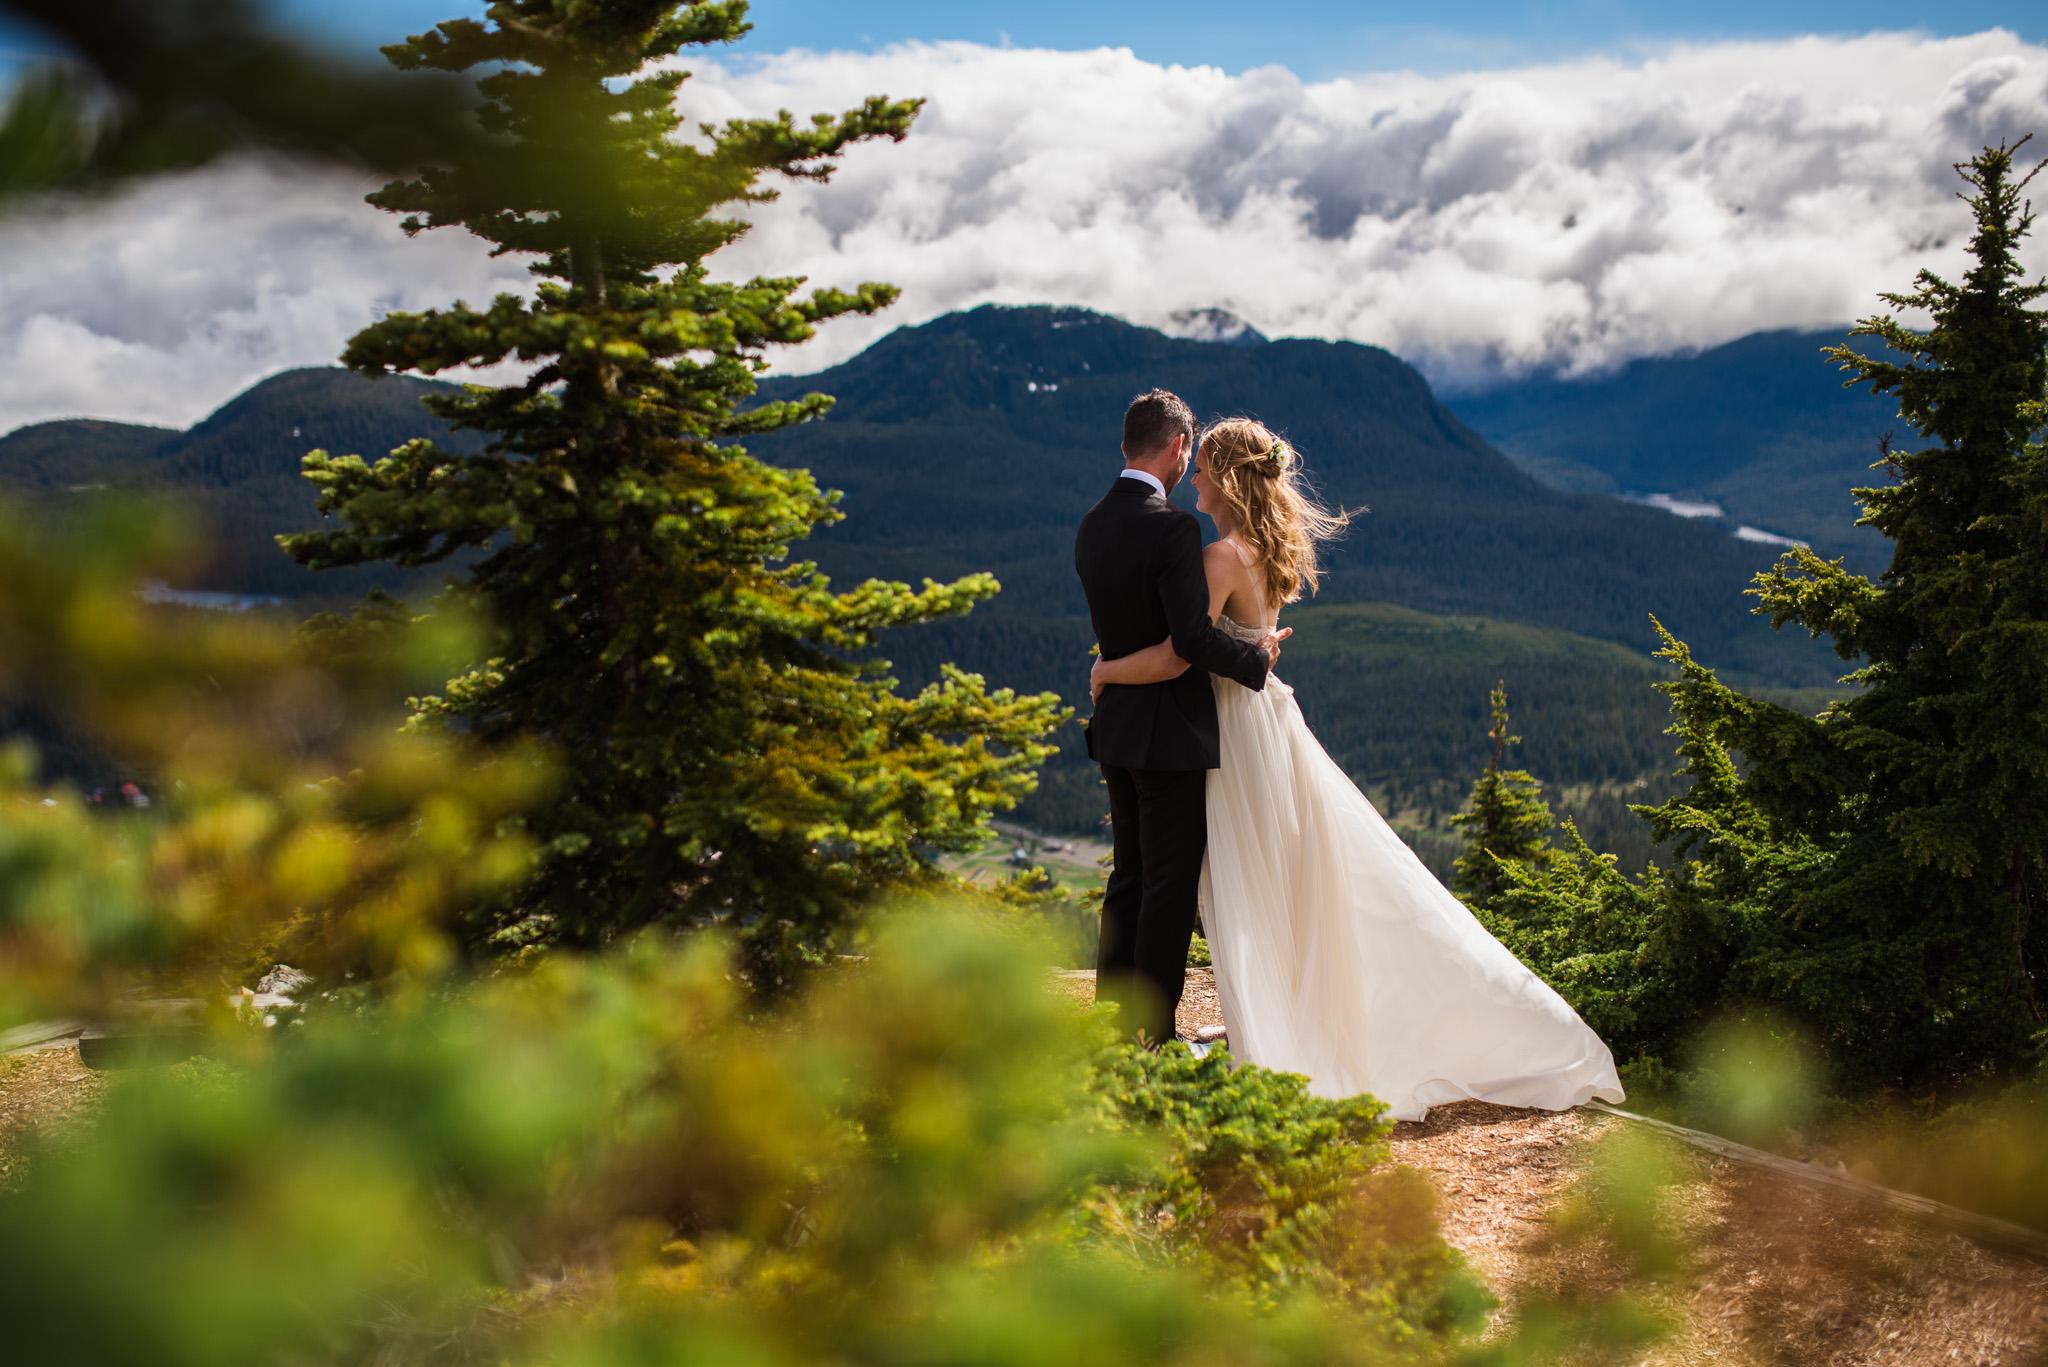 victoria-wedding-photographers-mount-washington-winter-wedding-39.jpg